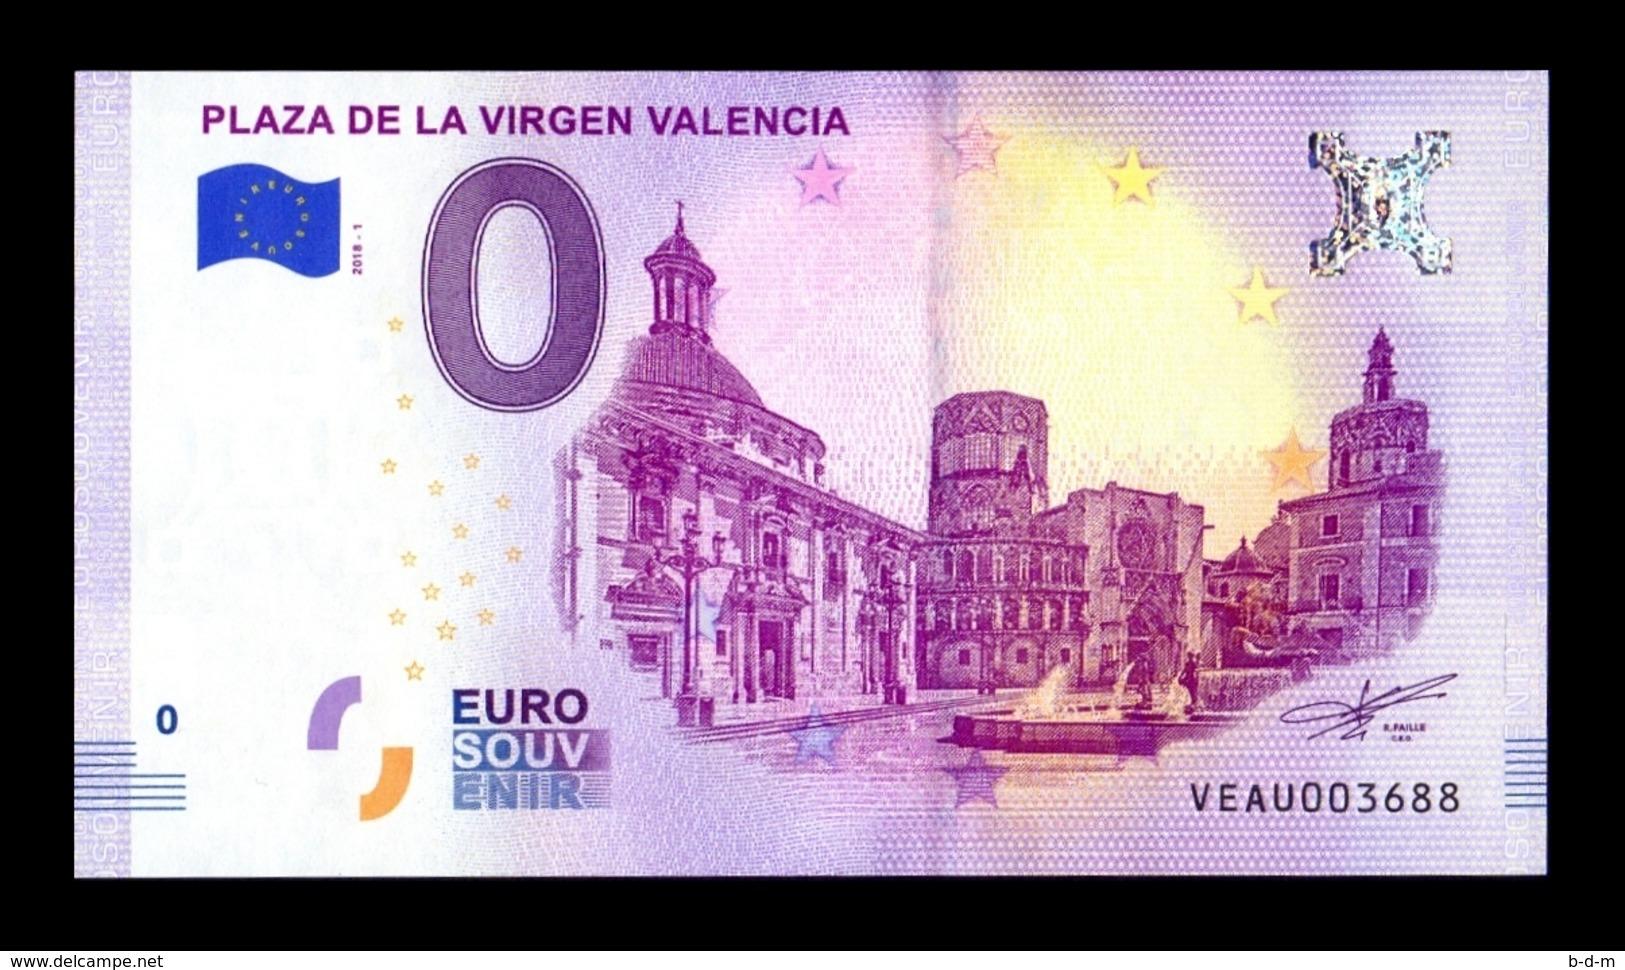 España Billete Souvenir Suvenir 0 Cero Euro 2018 Plaza De La Virgen Valencia - Espagne